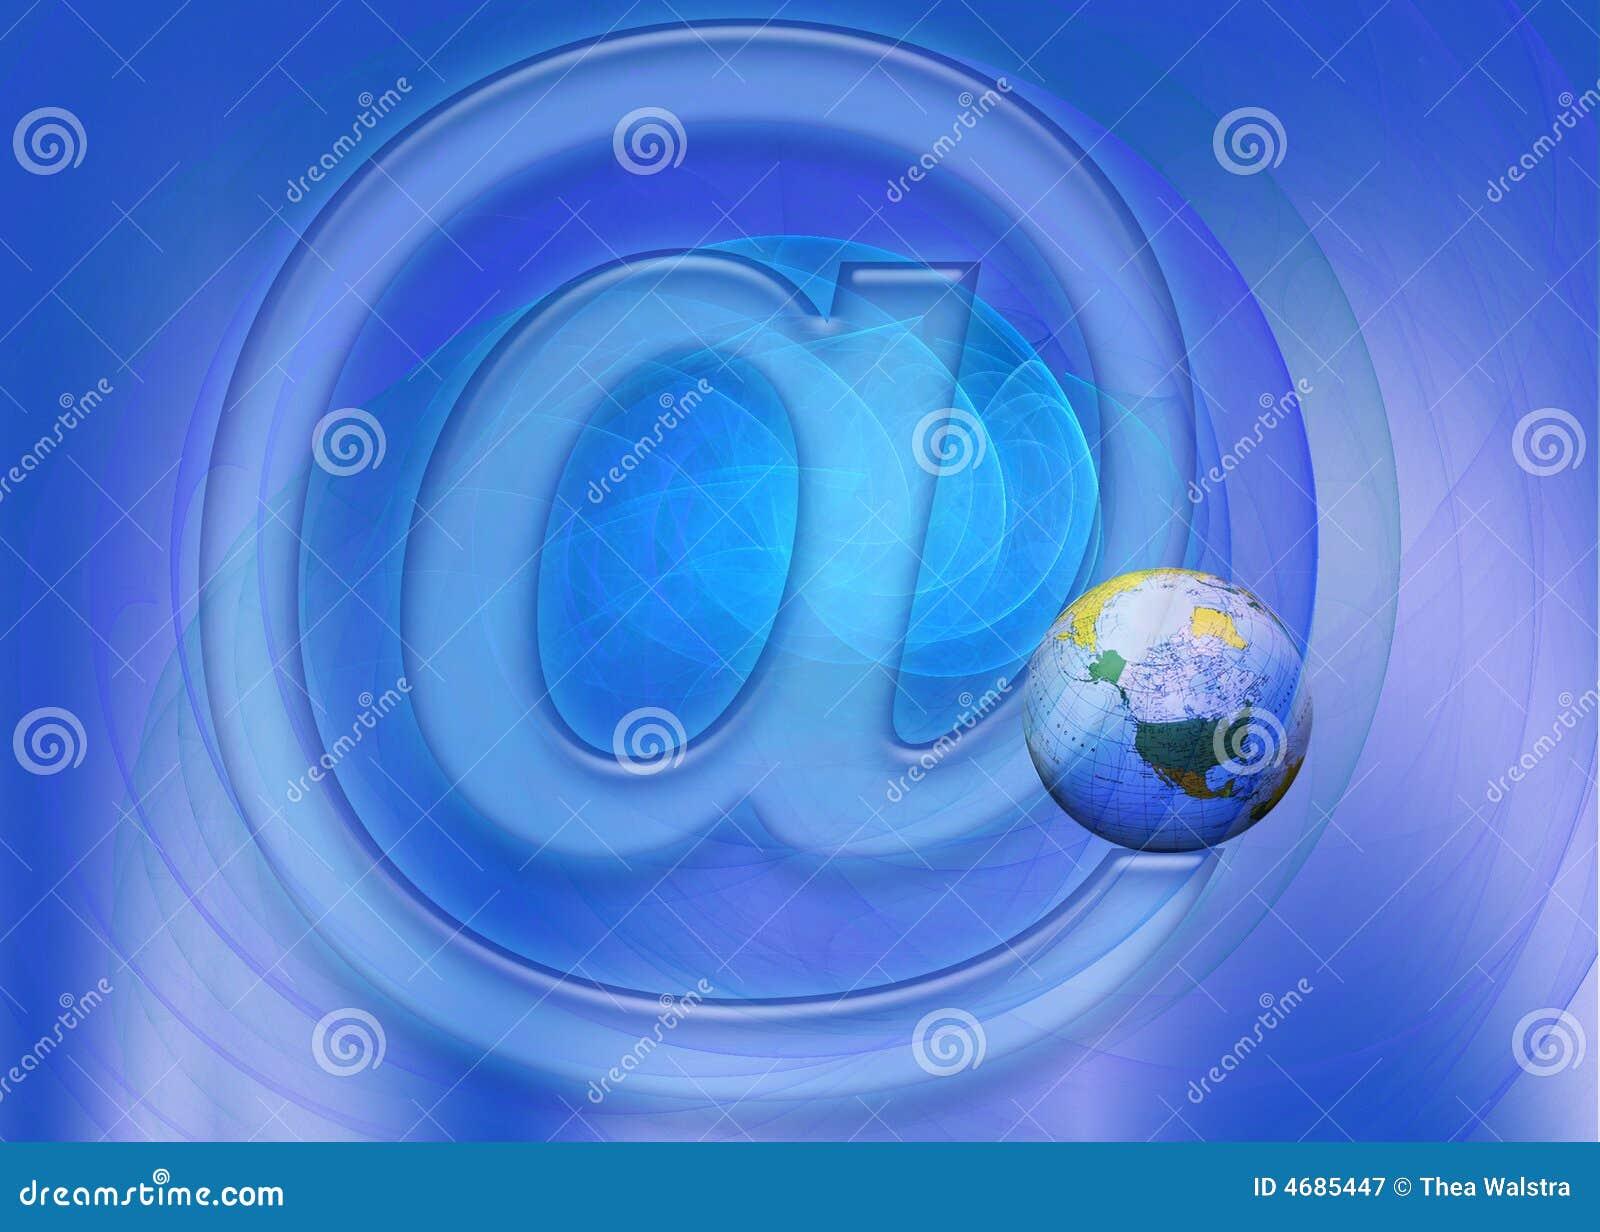 Free download internet explorer web browser computer icons.